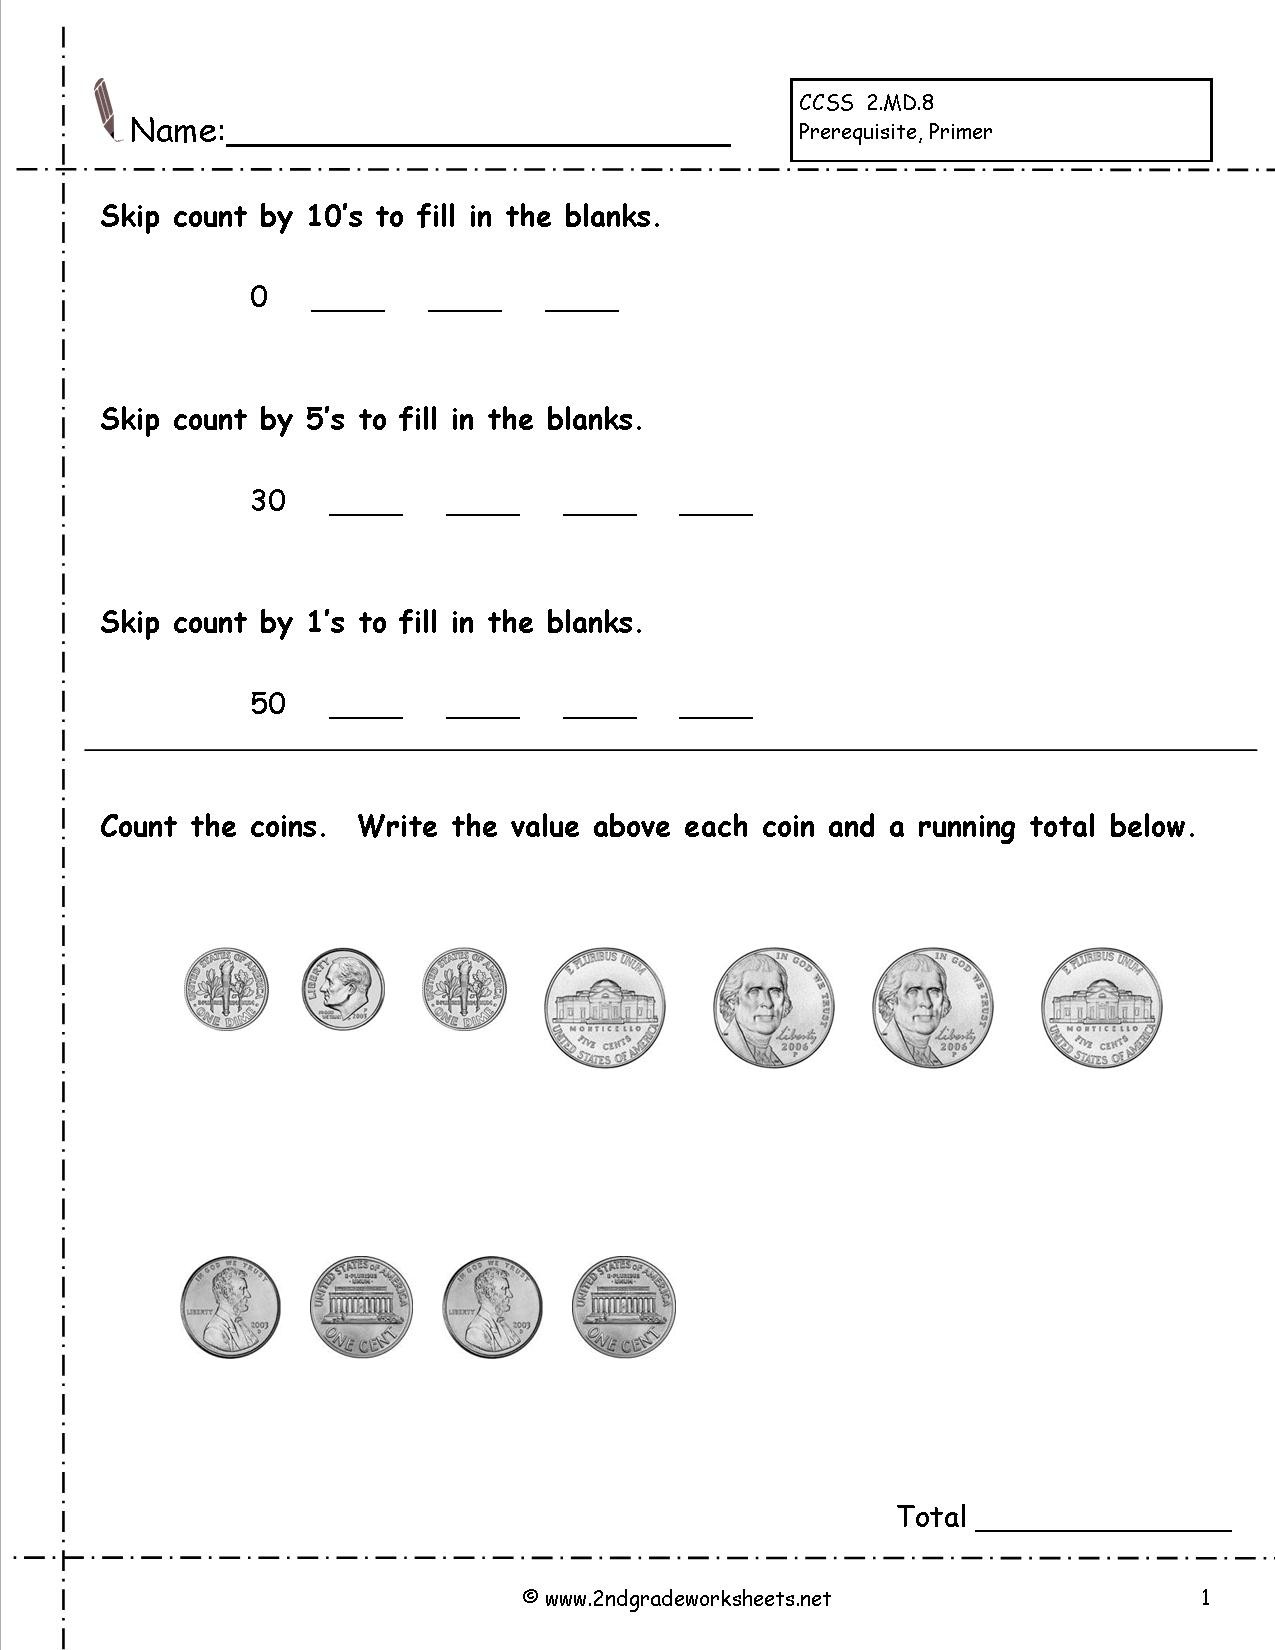 4 Free Math Worksheets Third Grade 3 Counting Money Money